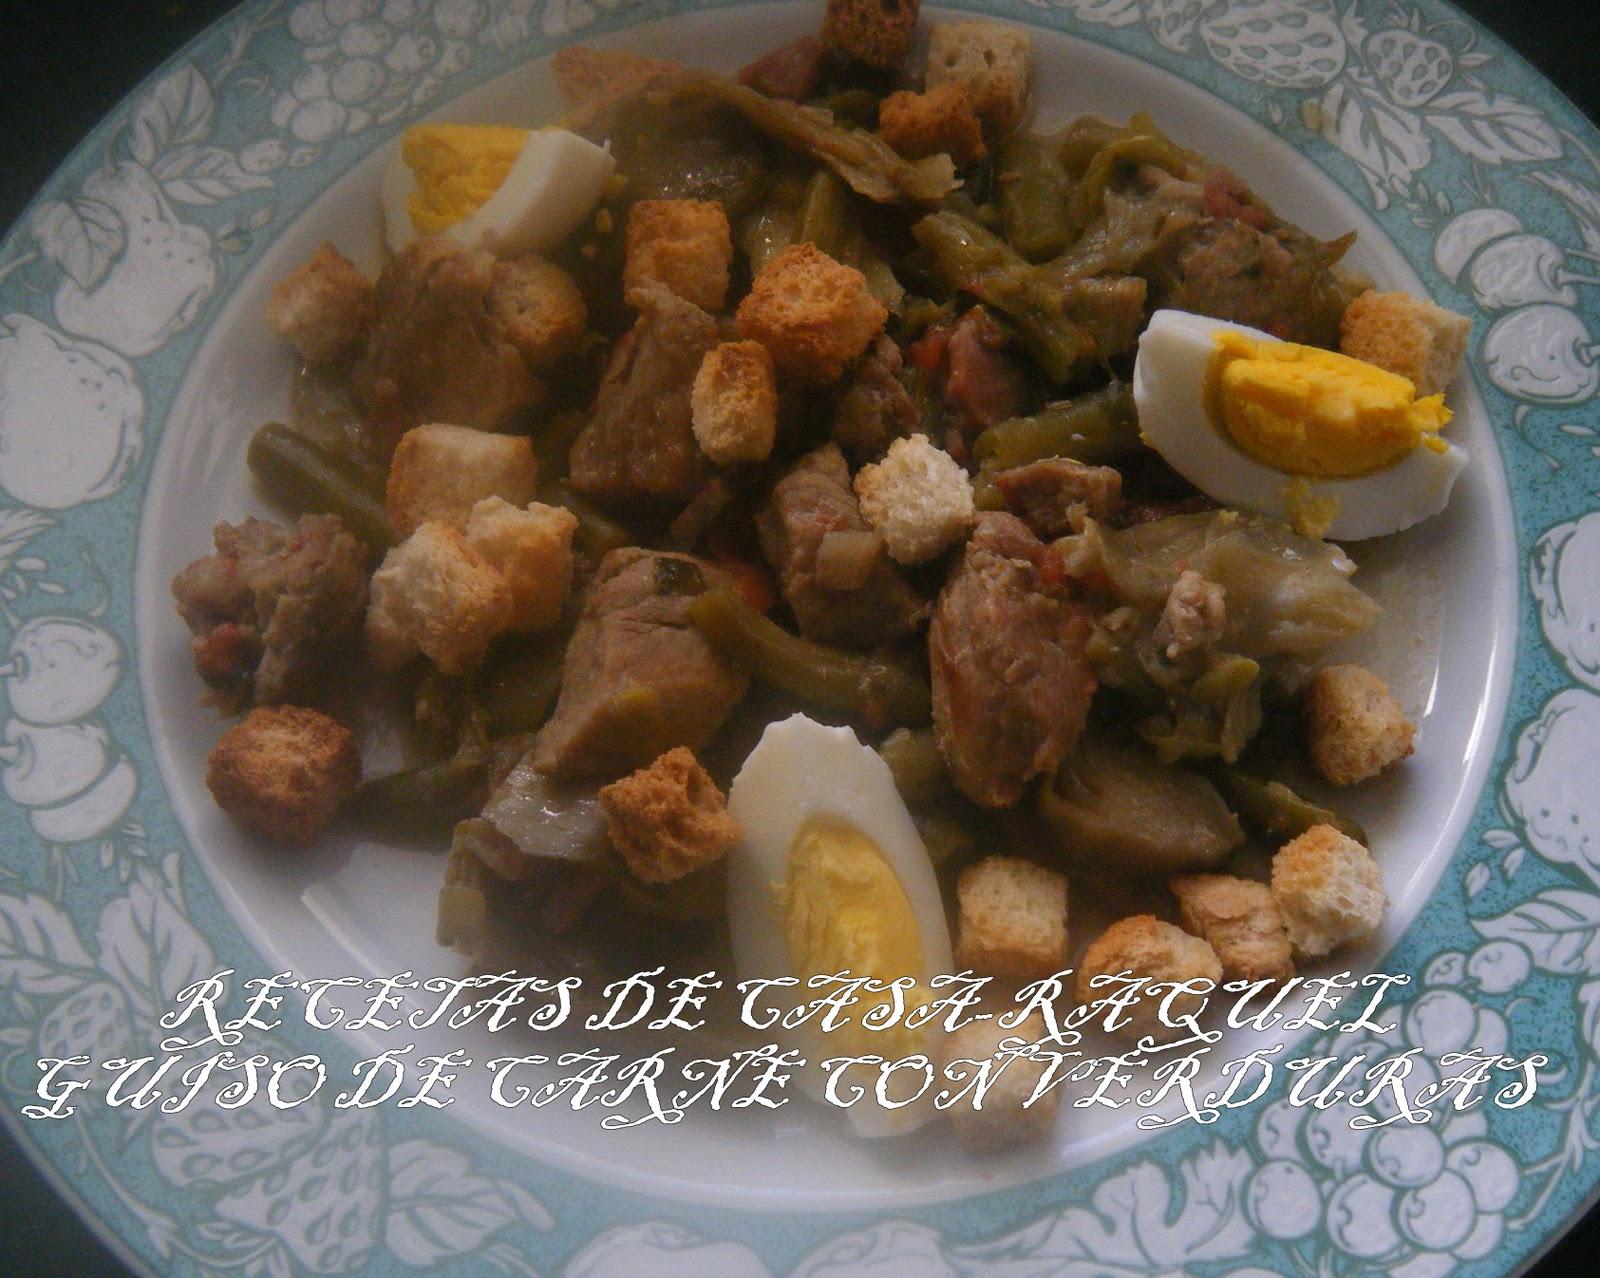 Recetas de casa raquel guiso de carne con verduras - Guiso de carne de cerdo ...